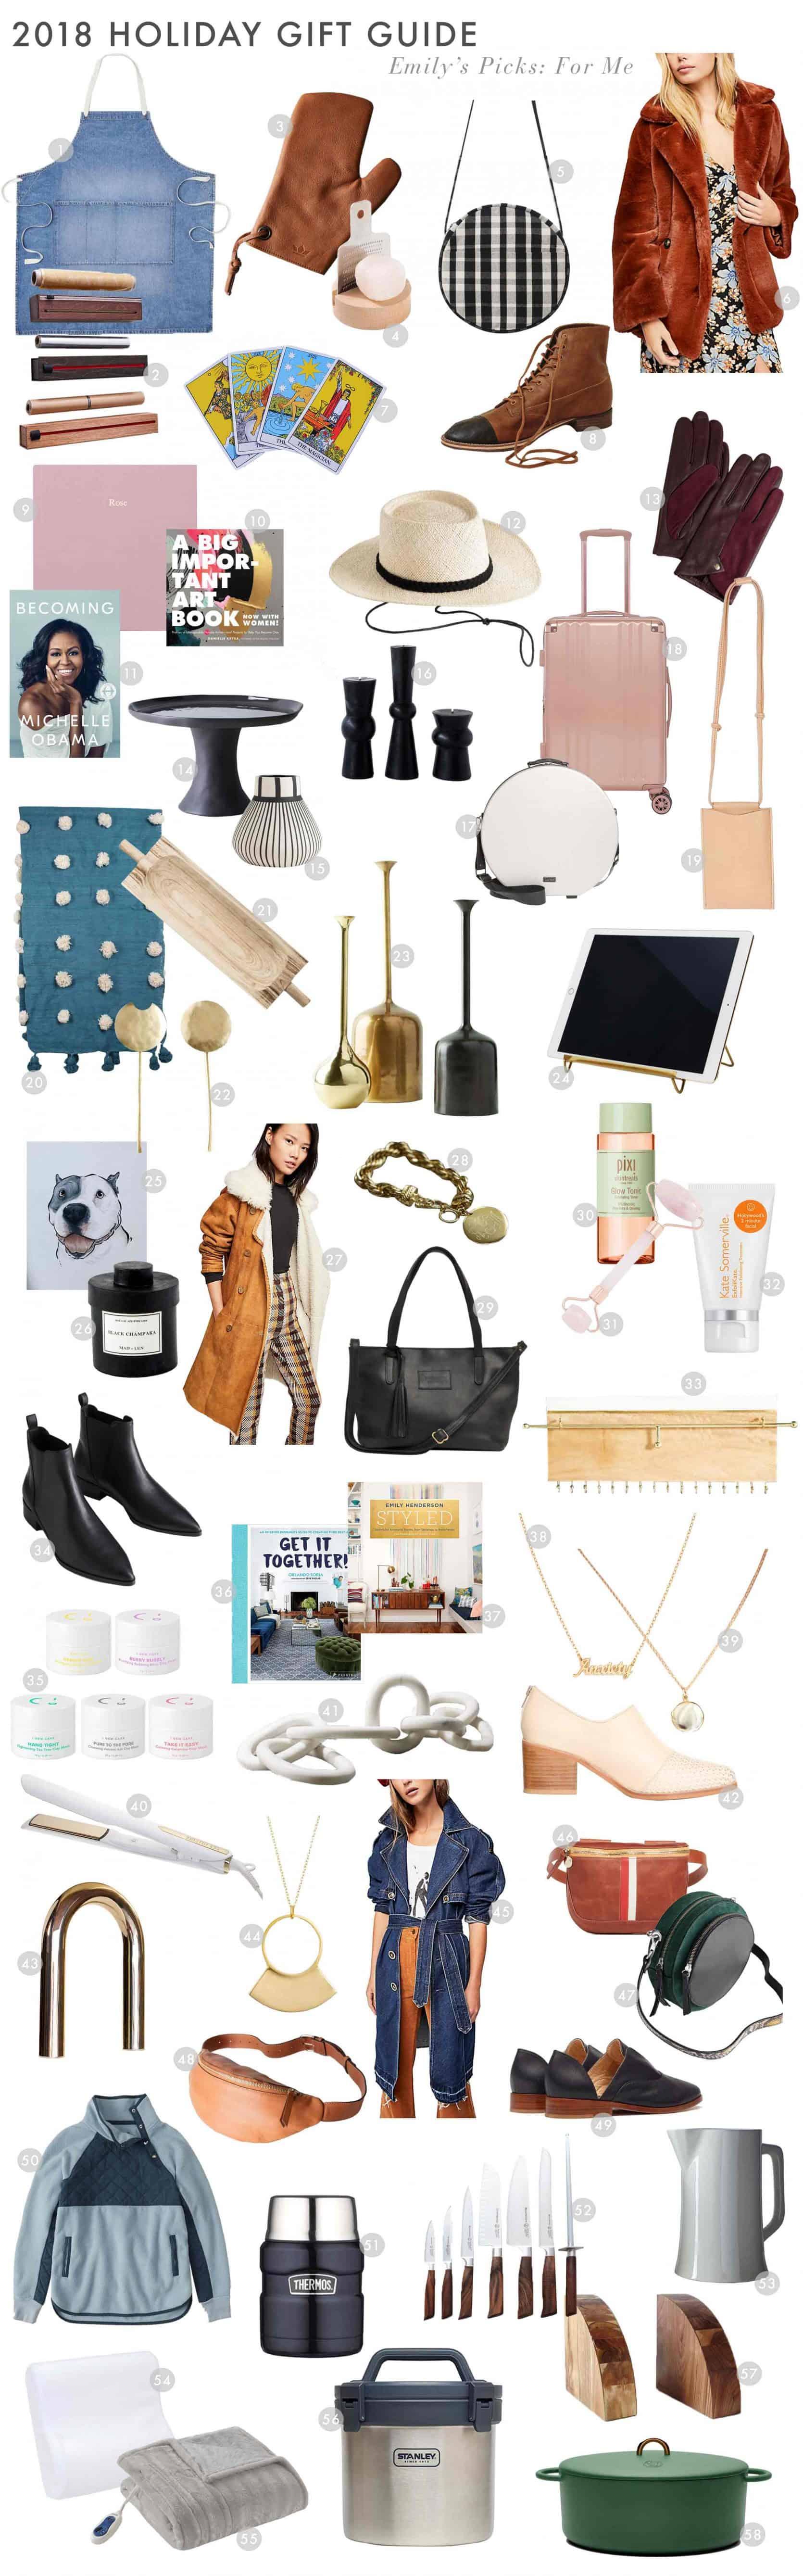 Emily Henderson 2018 Holiday Gift Guide Emilys Picks For Her Roundup 3